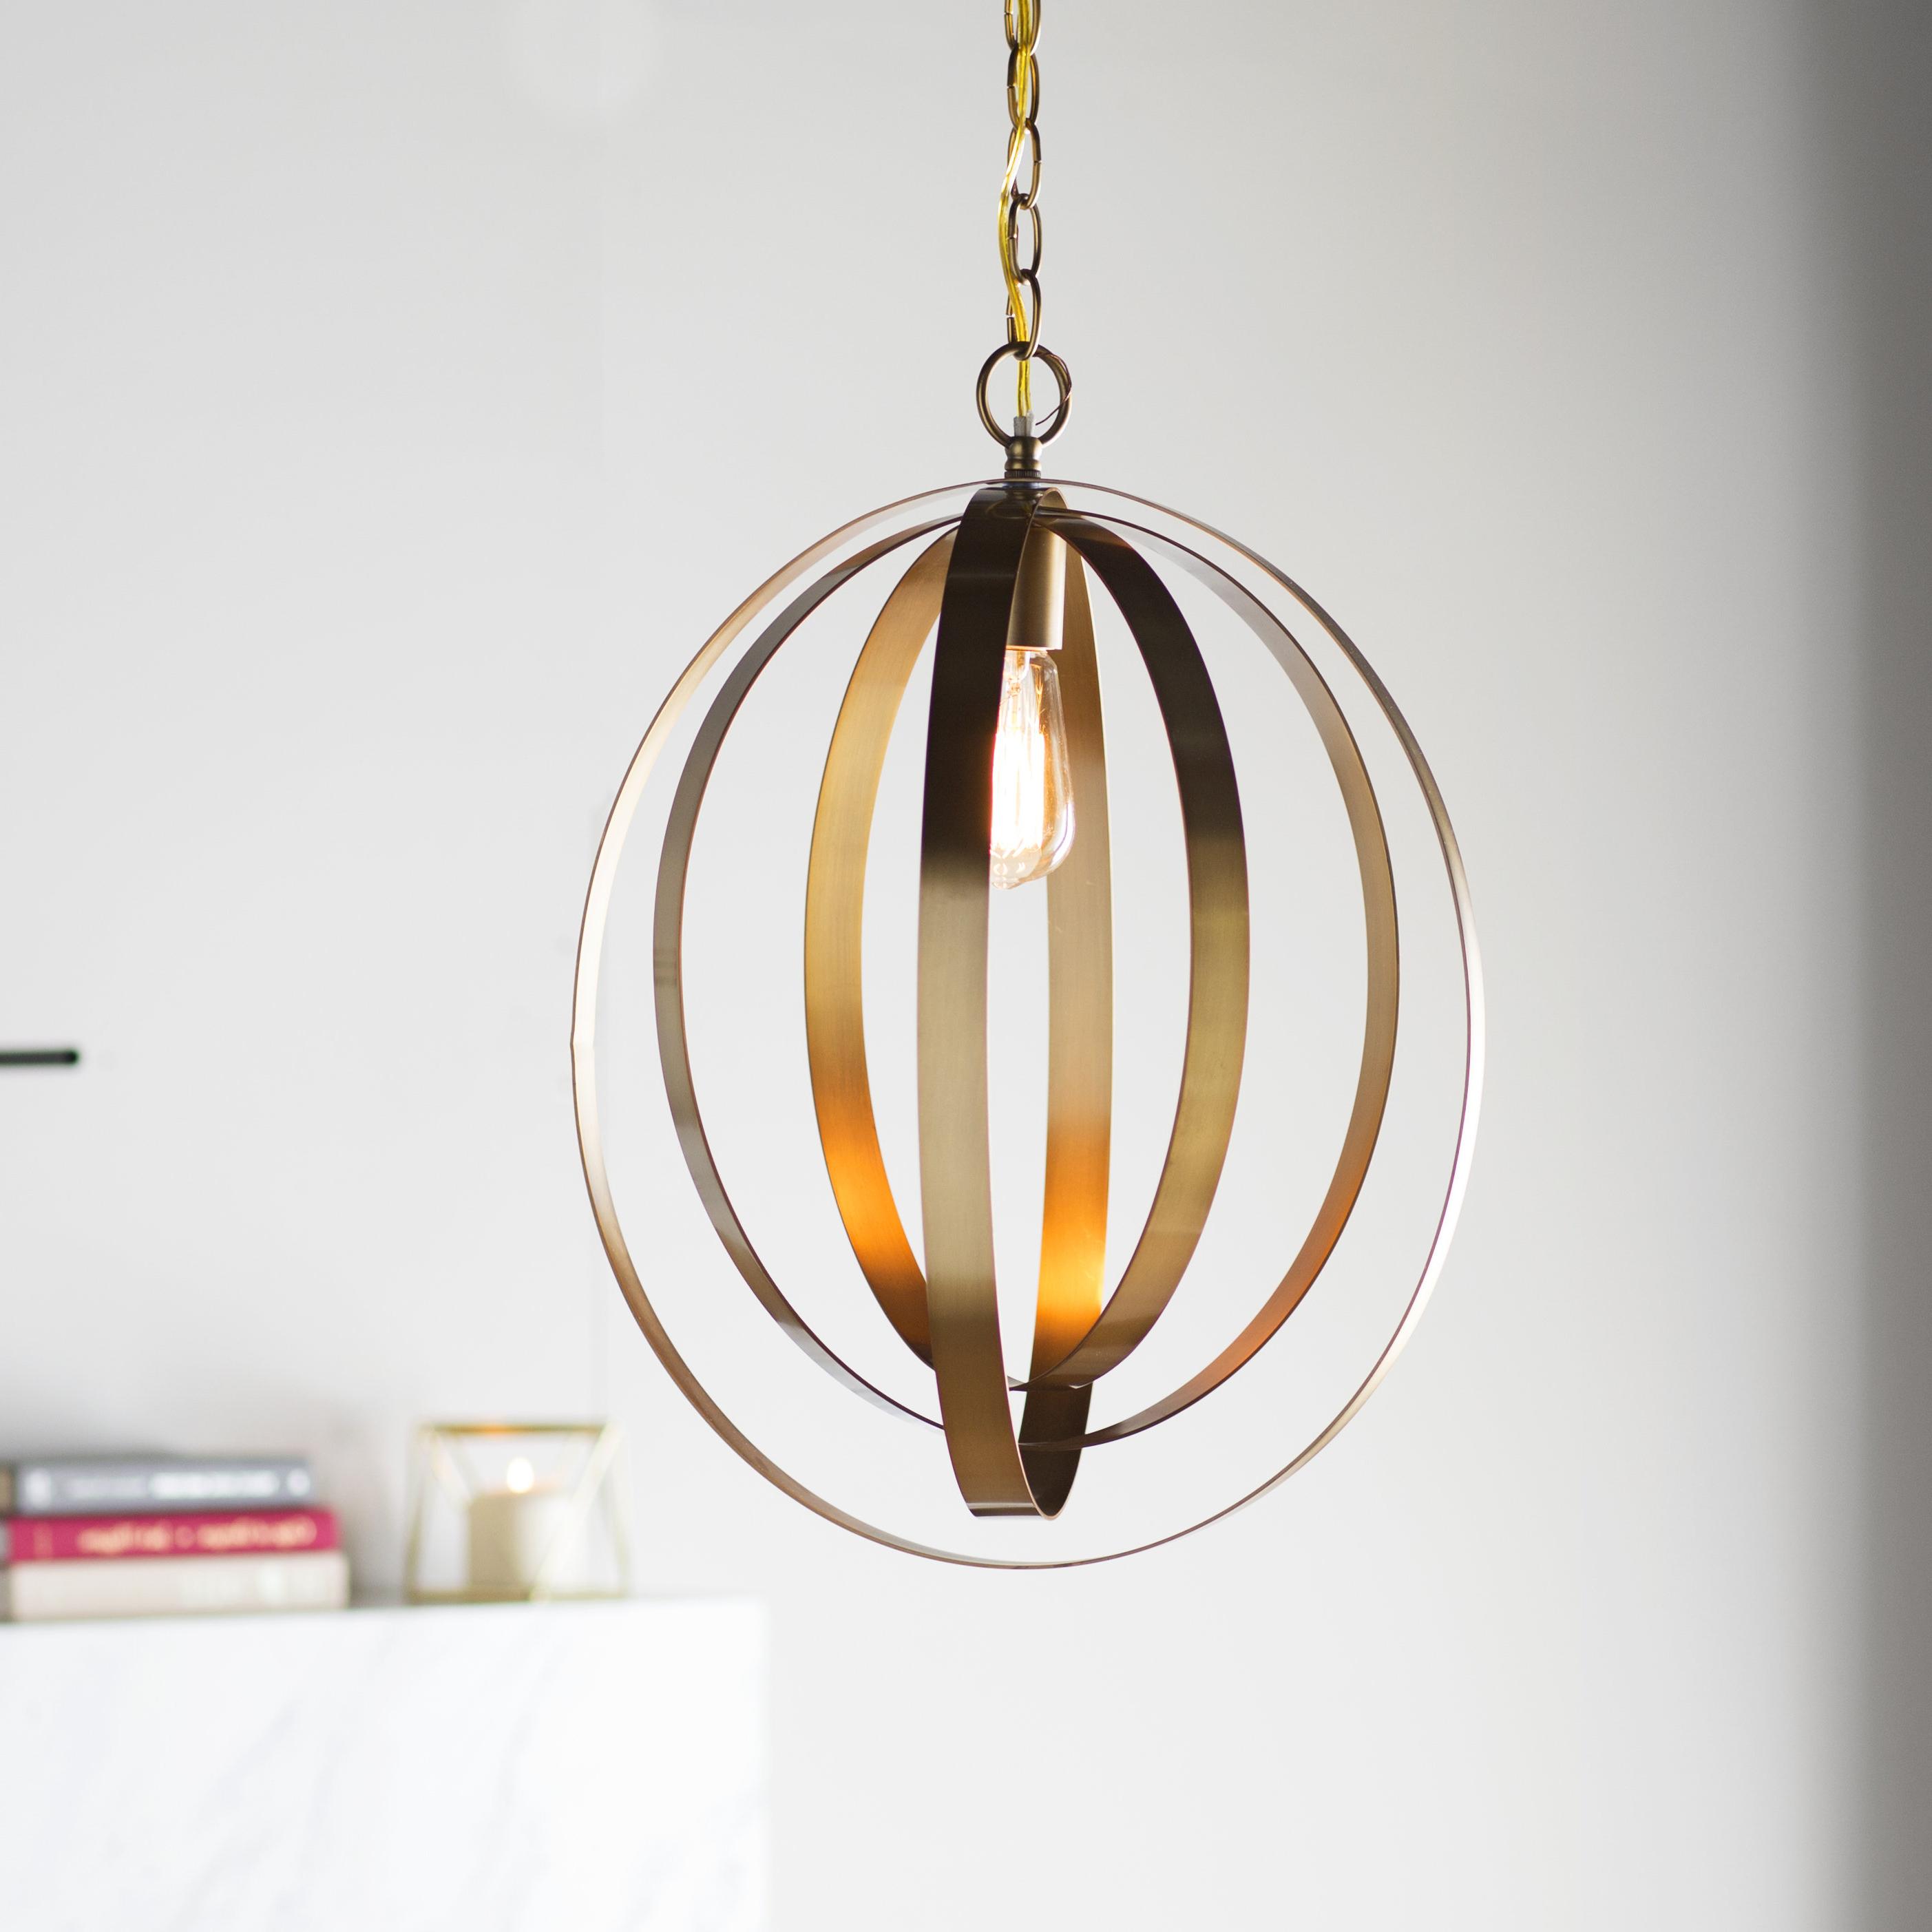 Kilby 1 Light Pendants Within Famous Arango 1 Light Led Globe Pendant (Gallery 7 of 20)